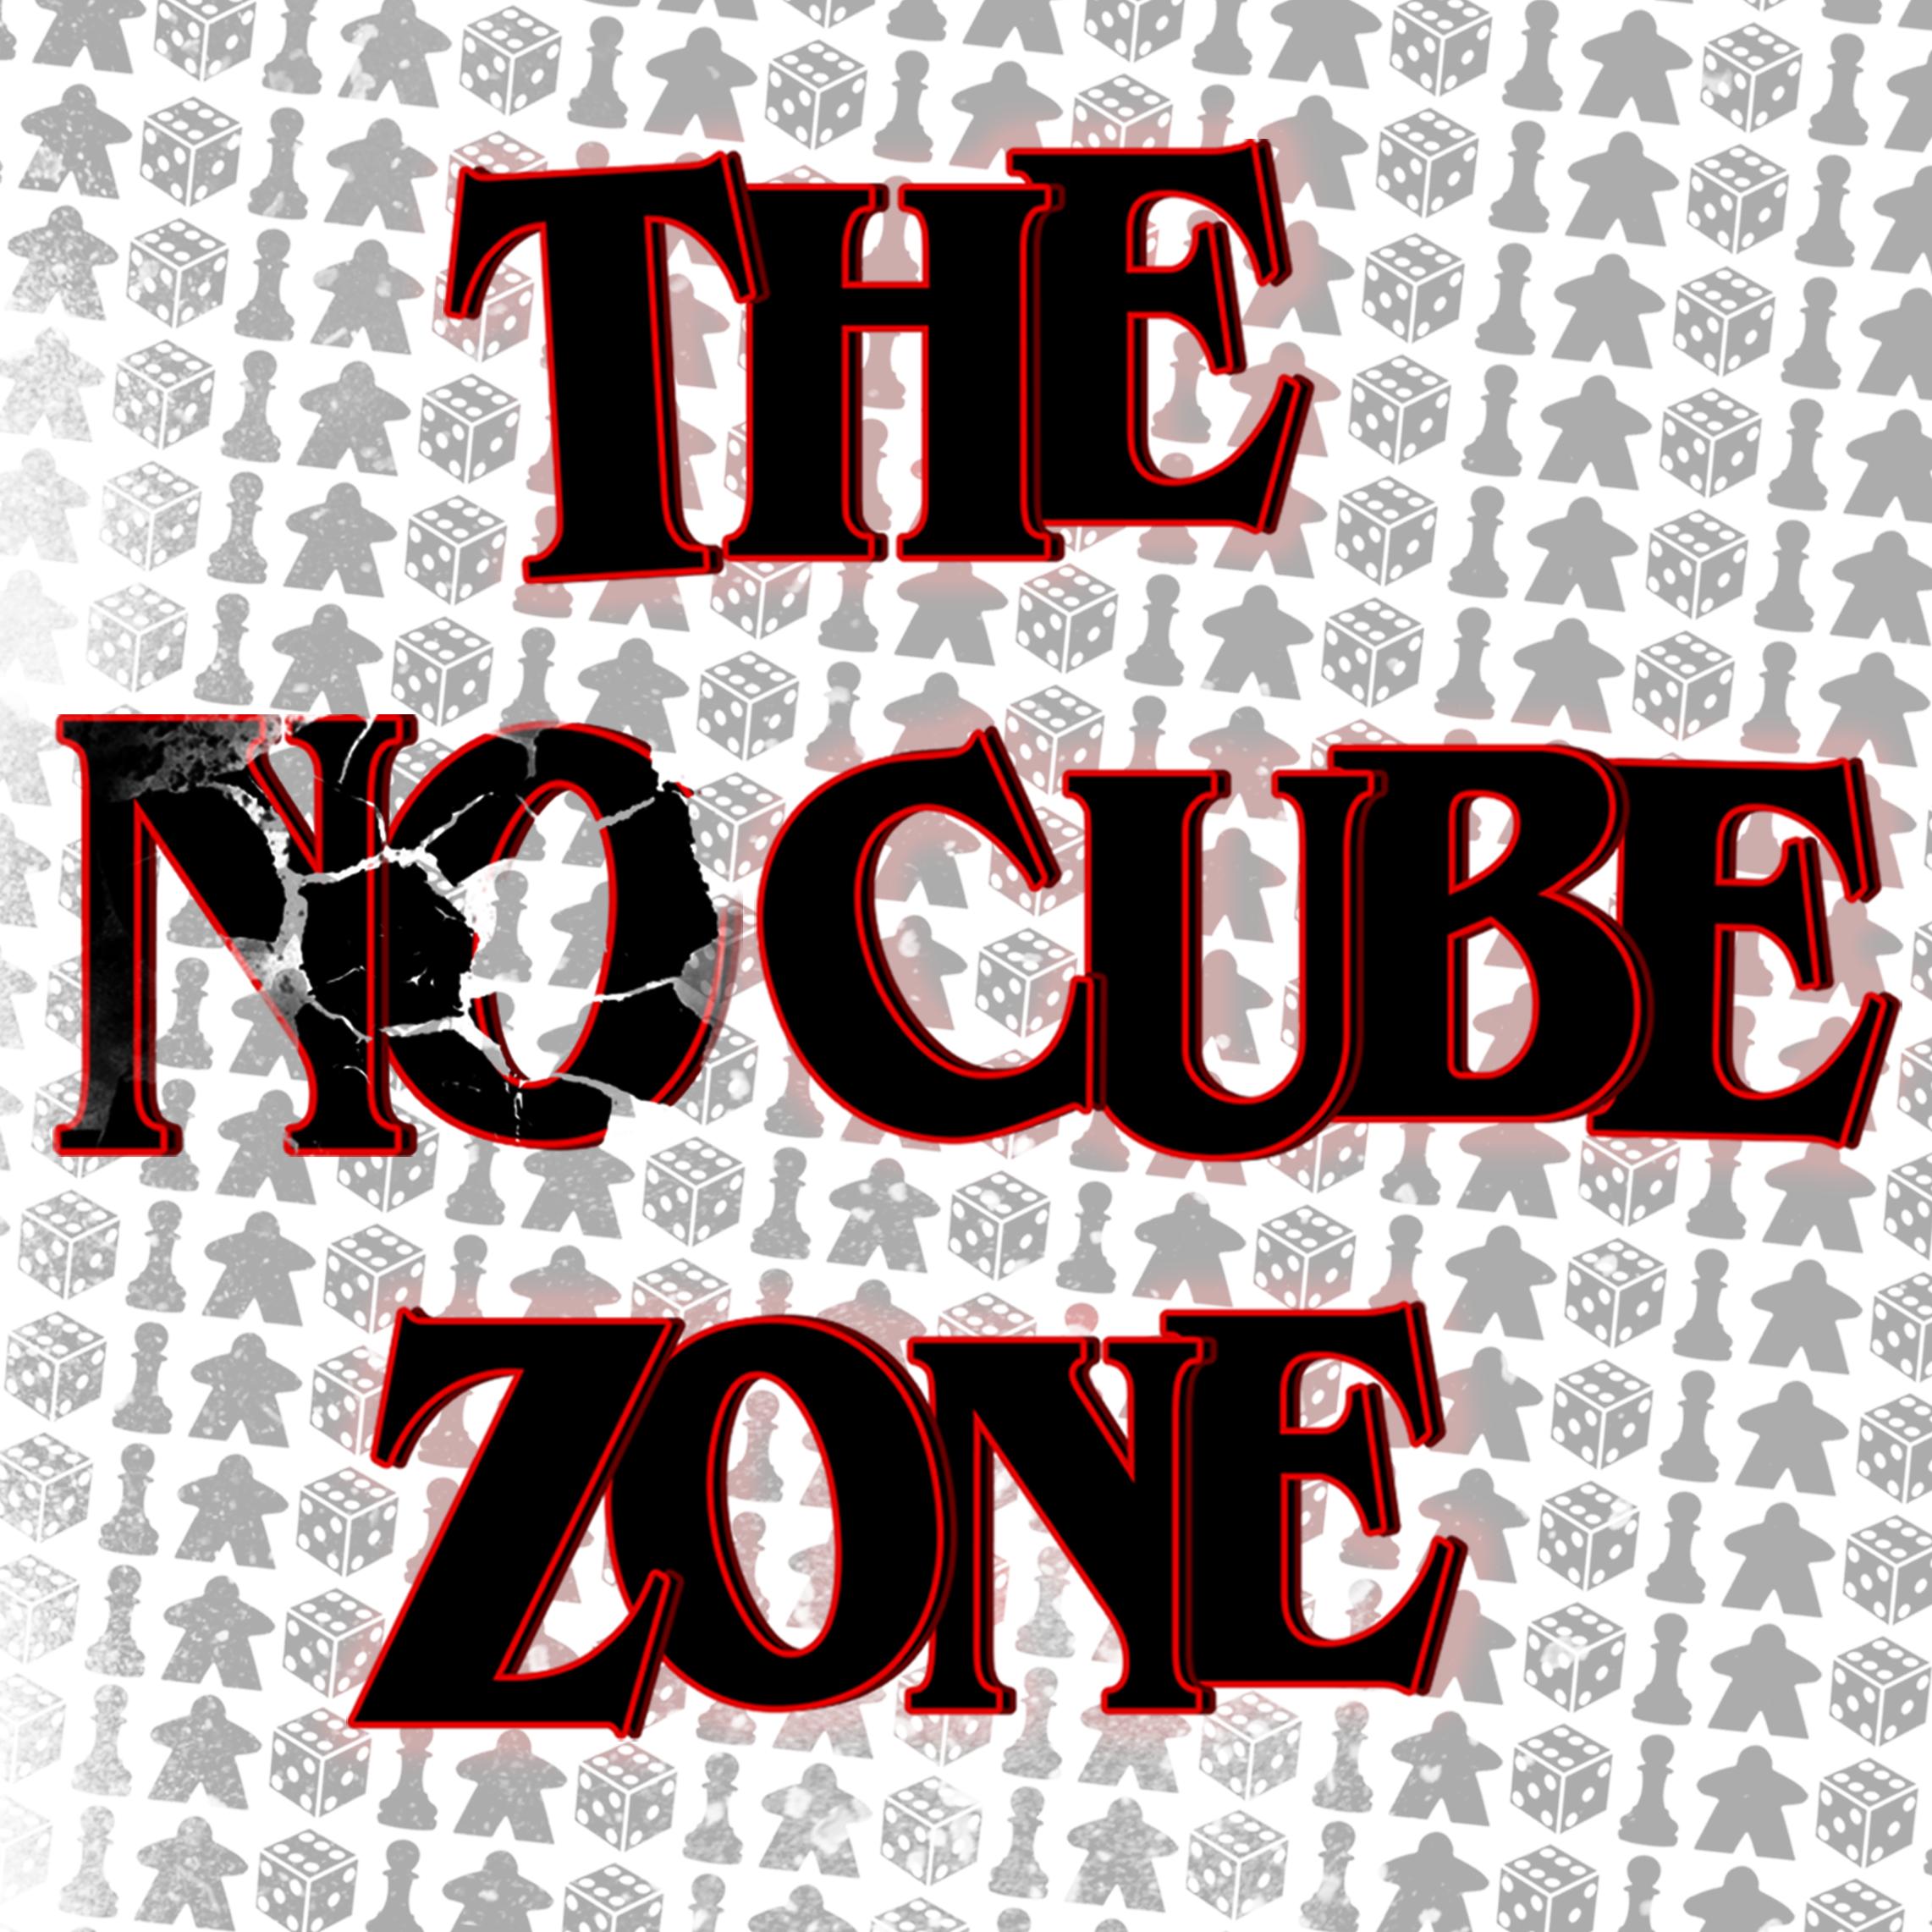 The No Cube Zone show art